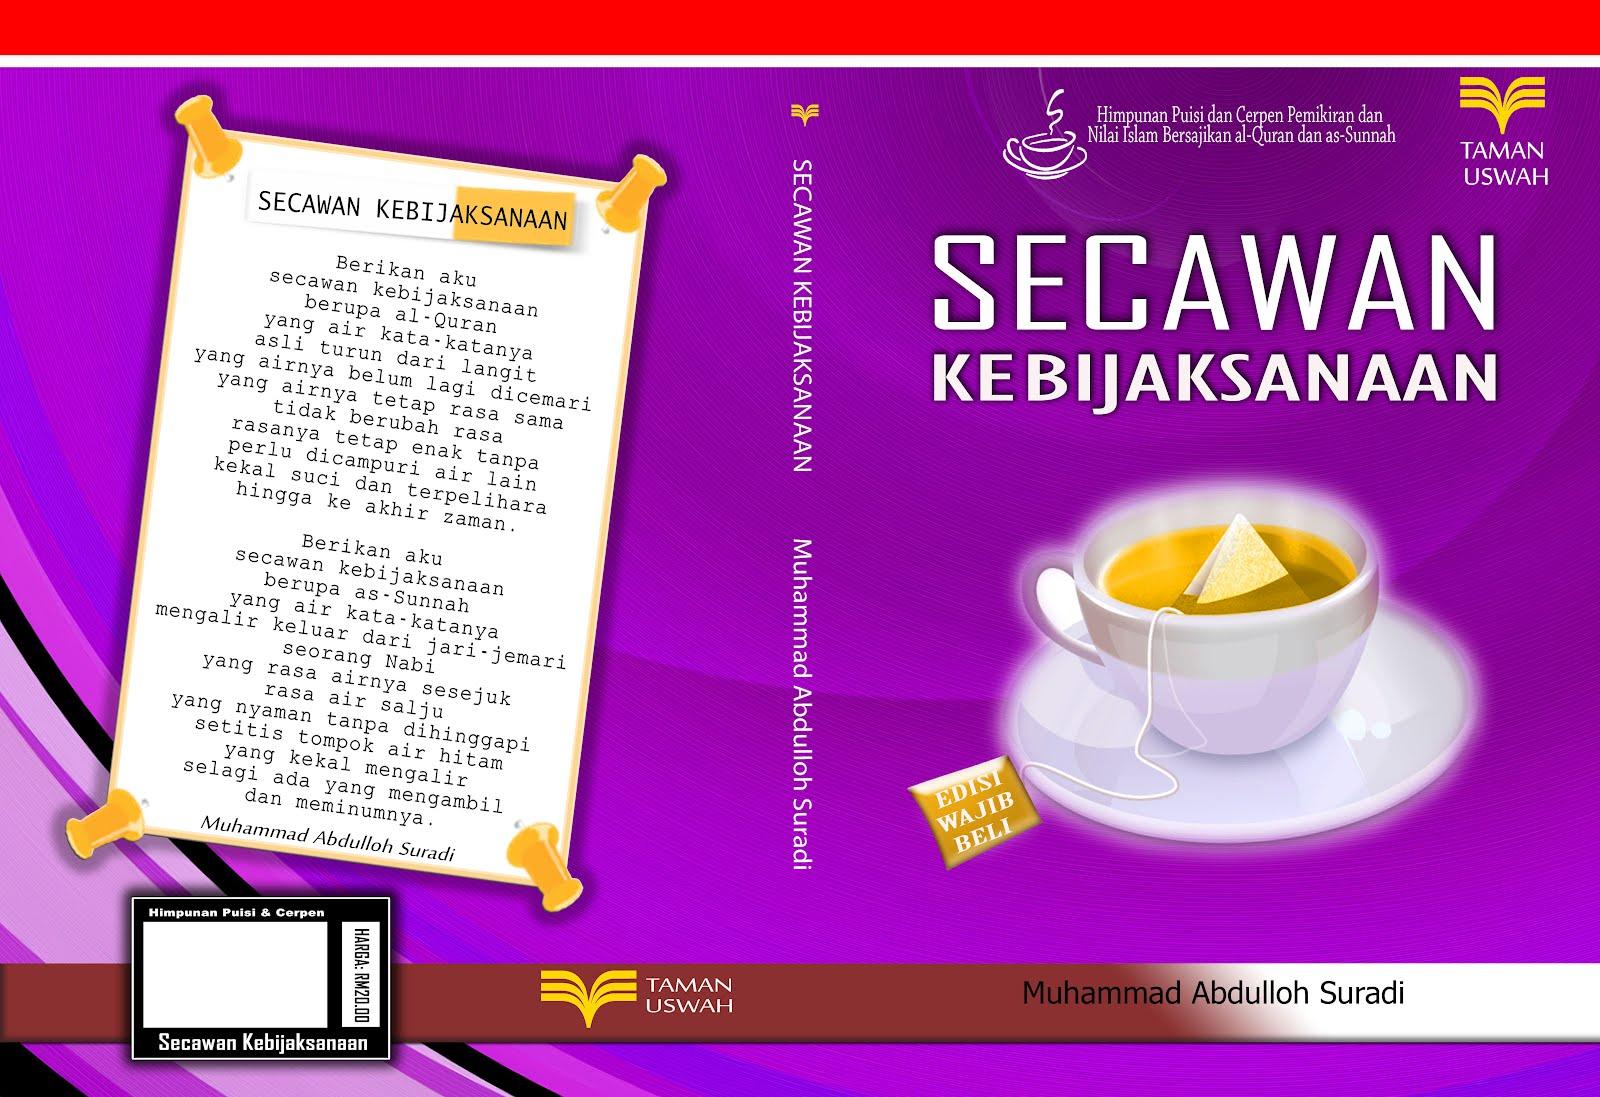 Buku Hadiah Buat Pencinta Sunnah Cover%2Bsecawan%2Bkebijaksanaan